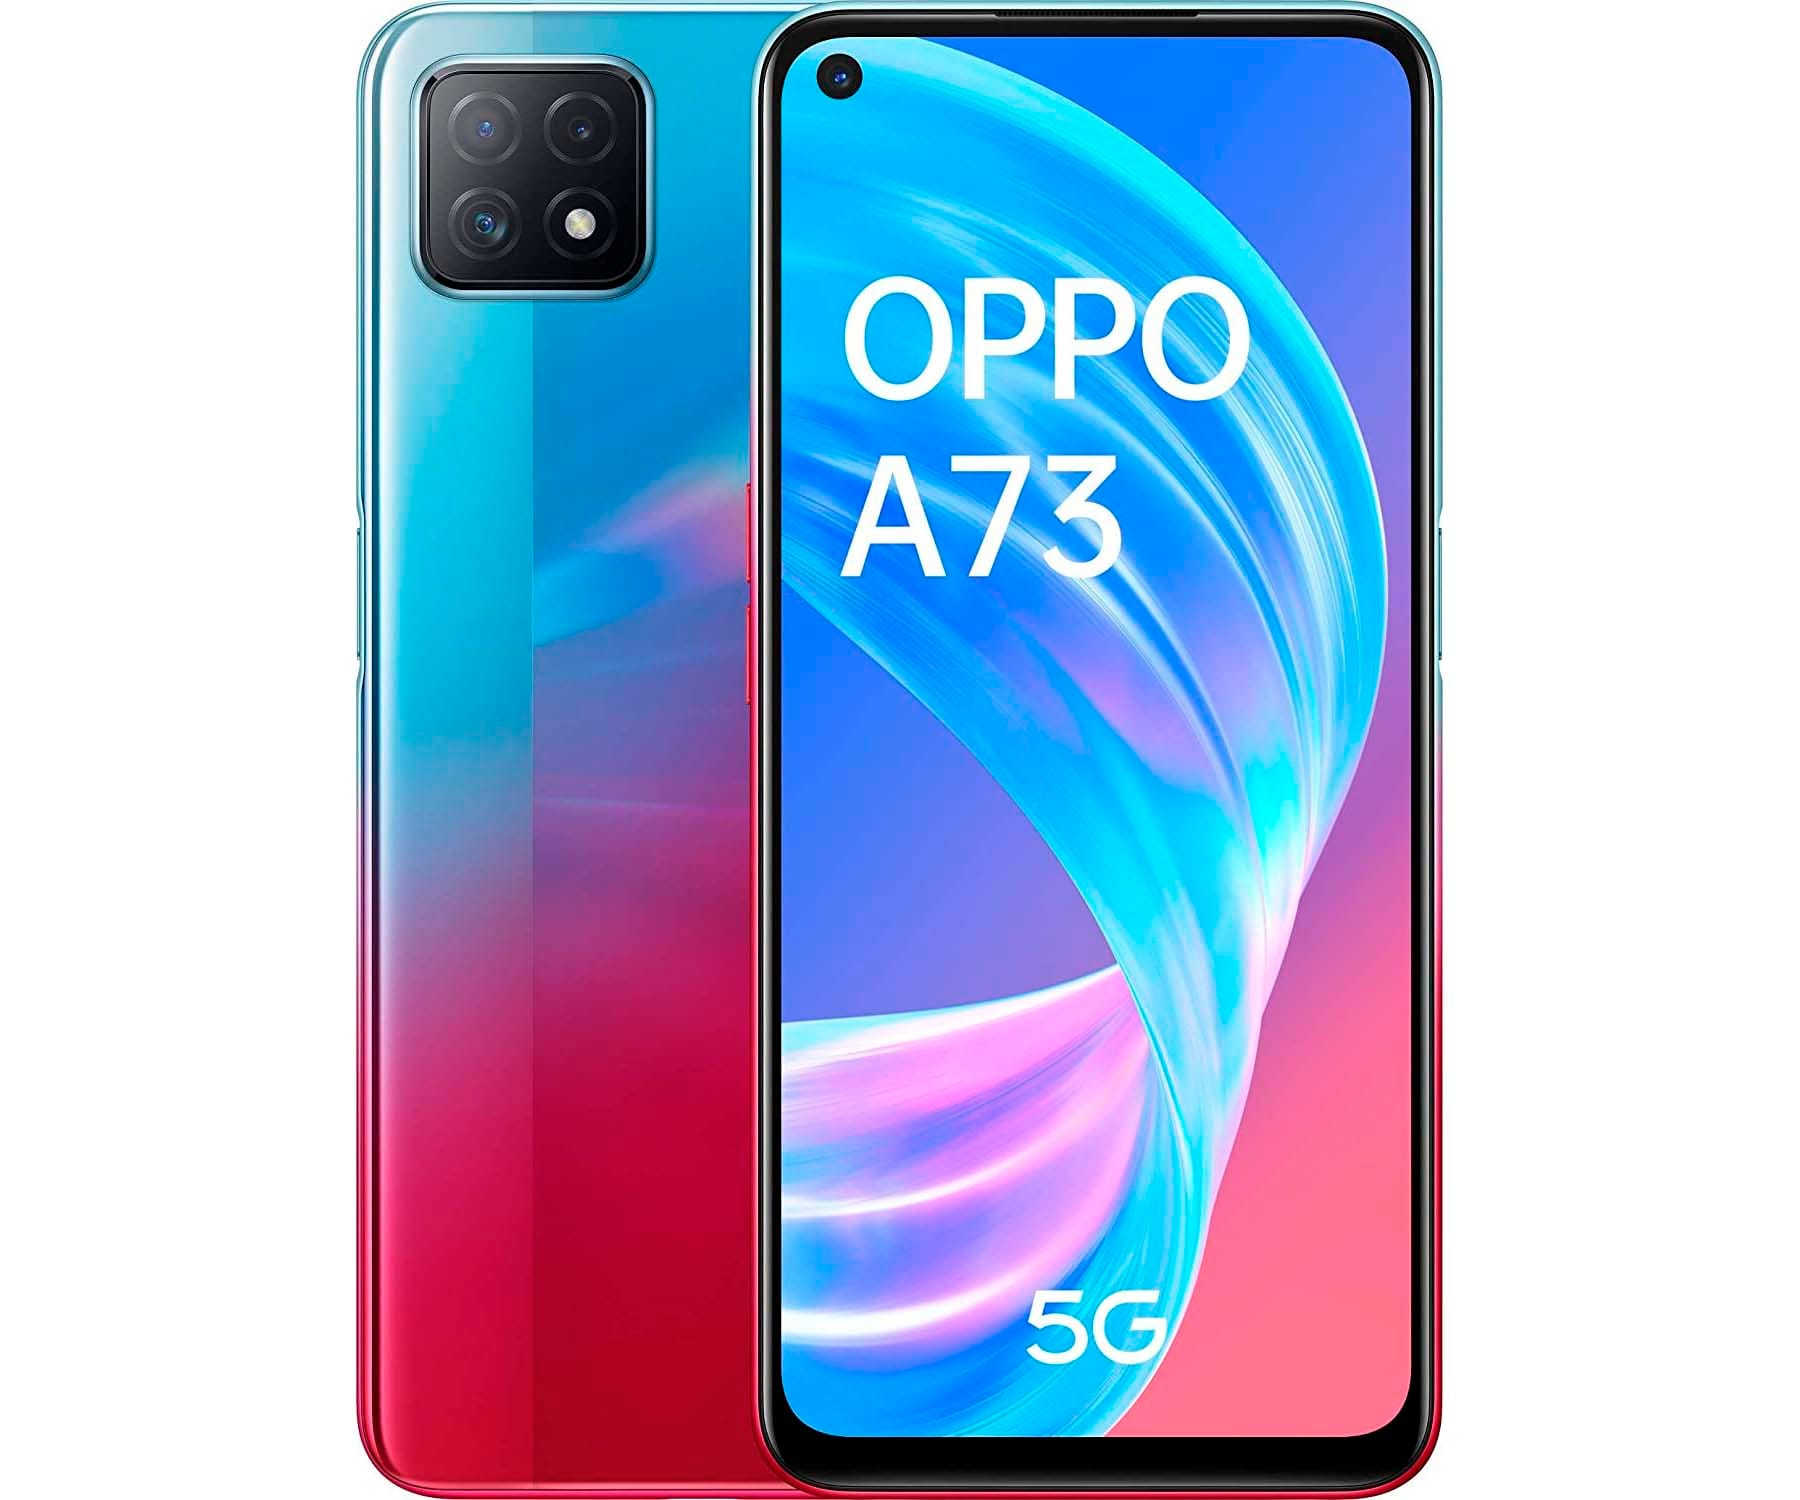 OPPO A73 NEON MÓVIL 5G DUAL SIM 6.5'' 90HZ FHD+ OCTACORE 128GB 8GB RAM TRICAM 16MP SELFIES 8MP